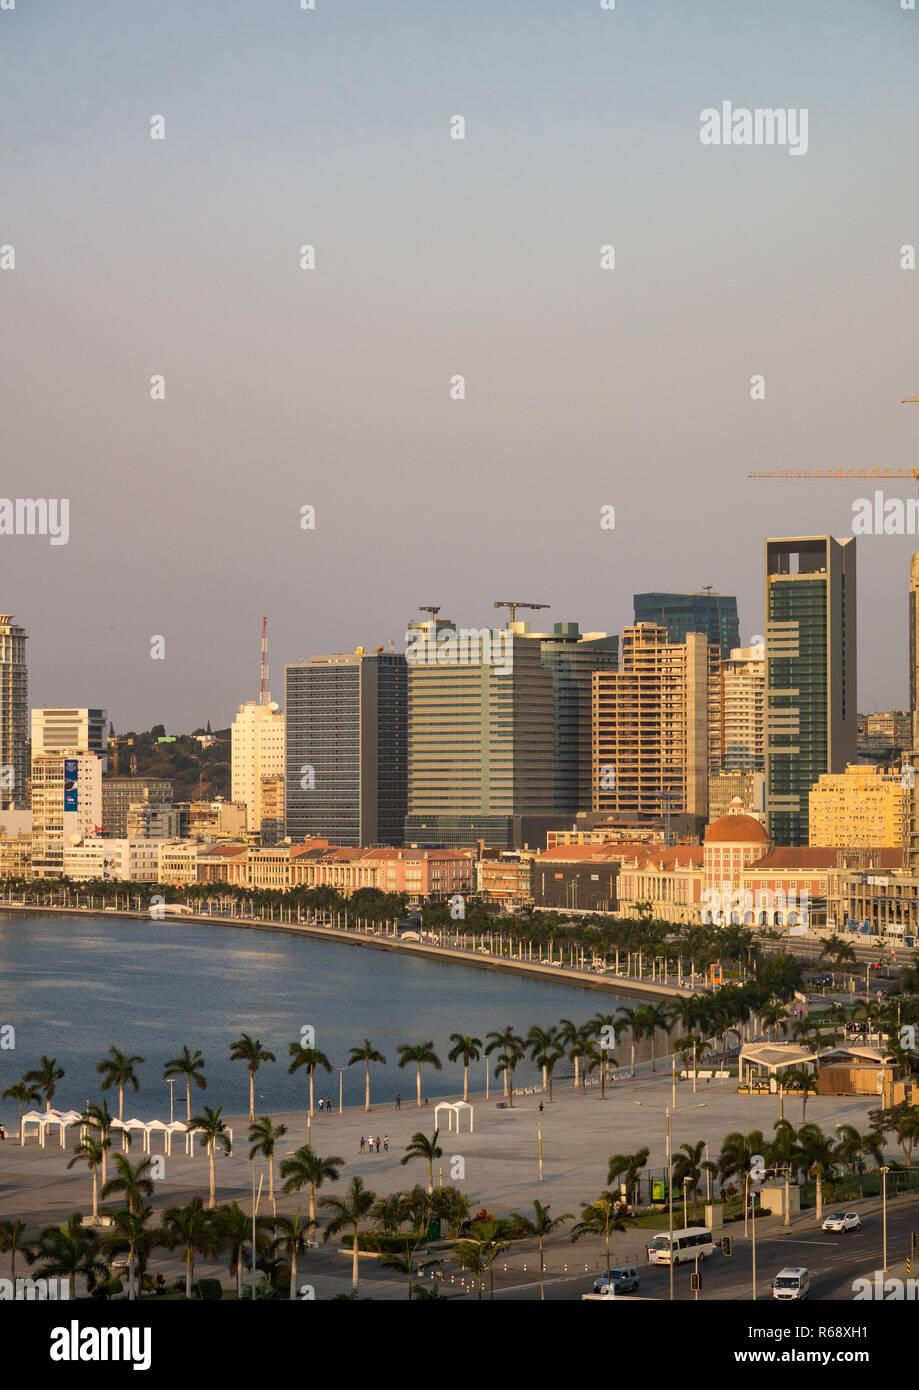 View of the Marginal promenade in Luanda city center at sunset, Luanda Province, Luanda, Angola - Stock Image